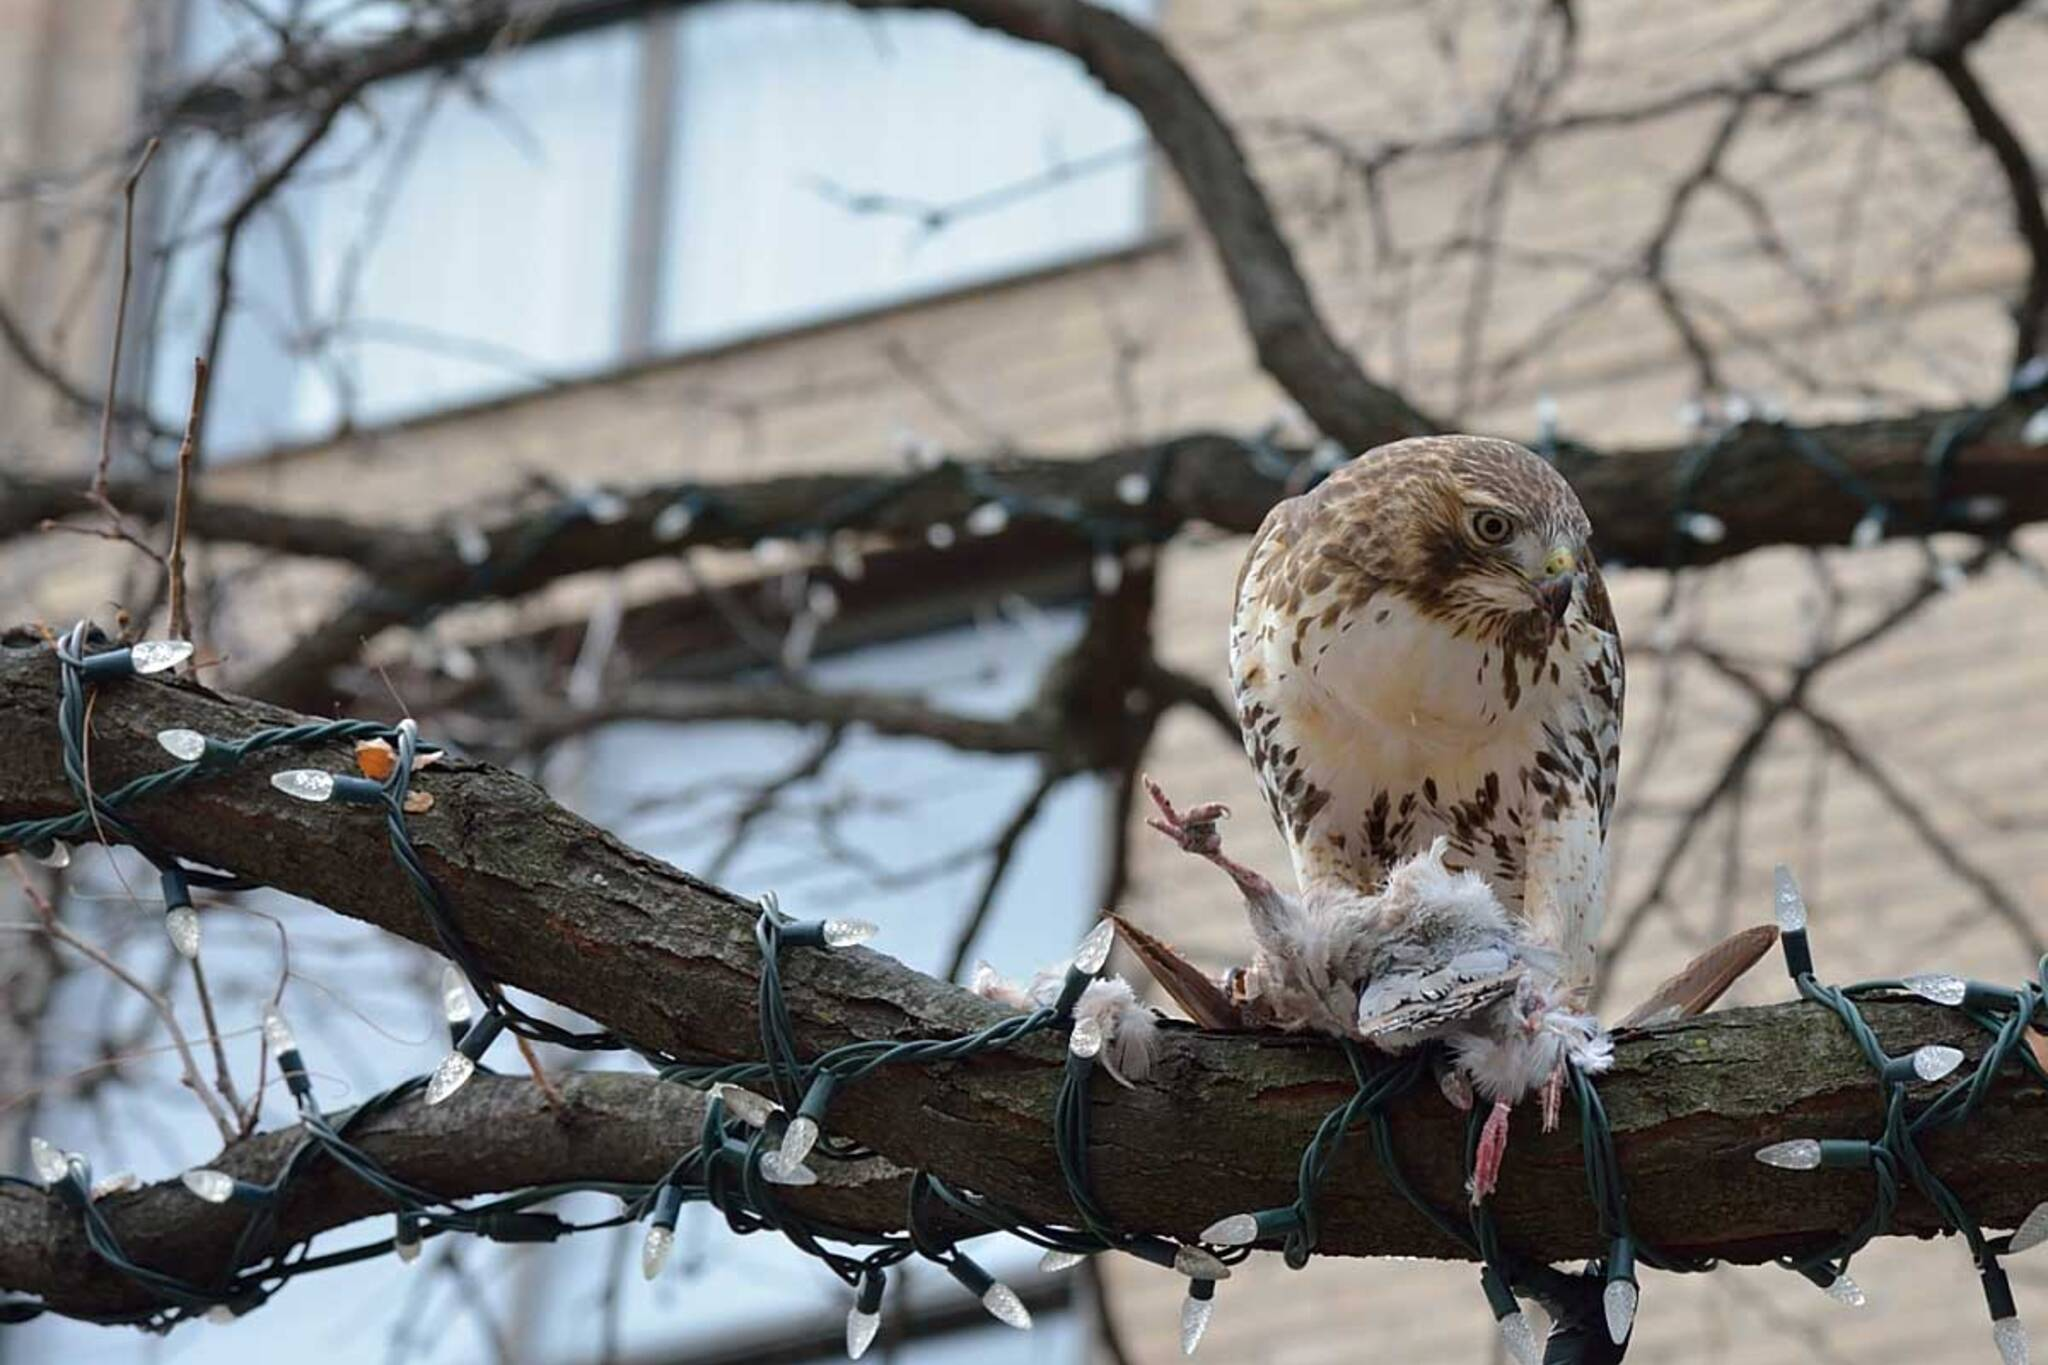 Toronto hawk